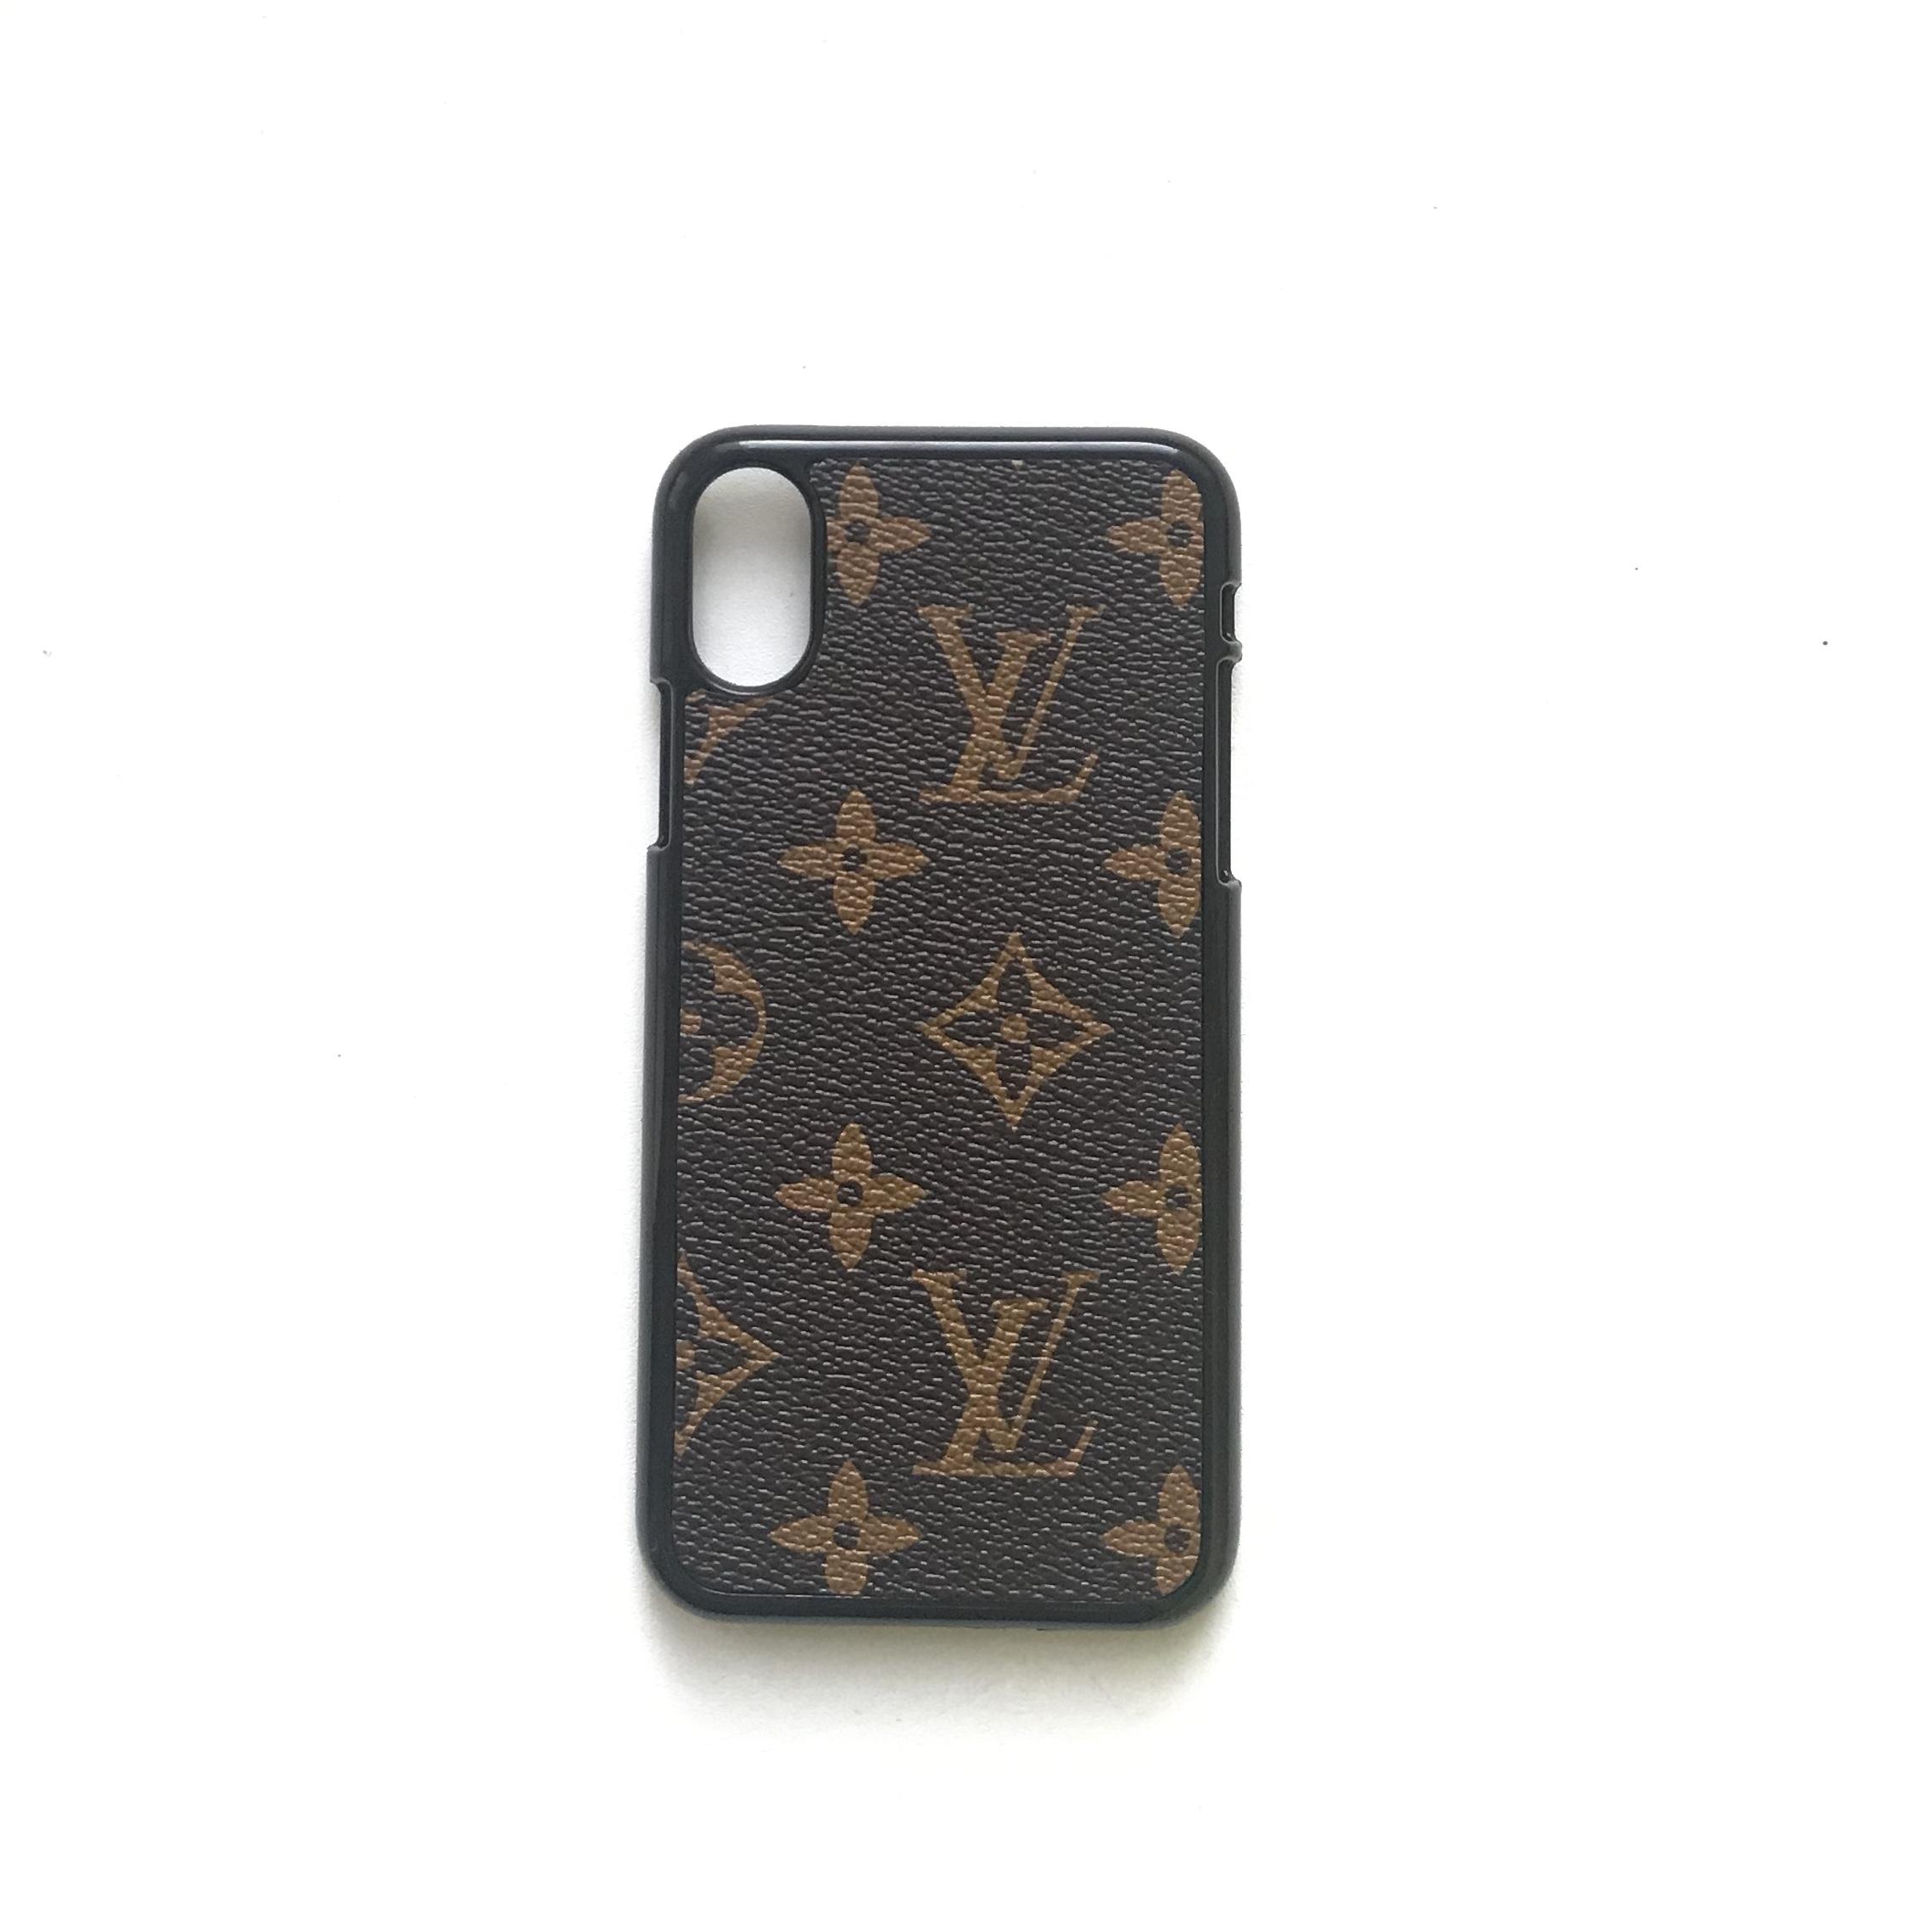 new concept 28065 ac8bf Custom Louis Vuitton iPhone X/7/8/8 Plus/XR/XS/XS MAX Case